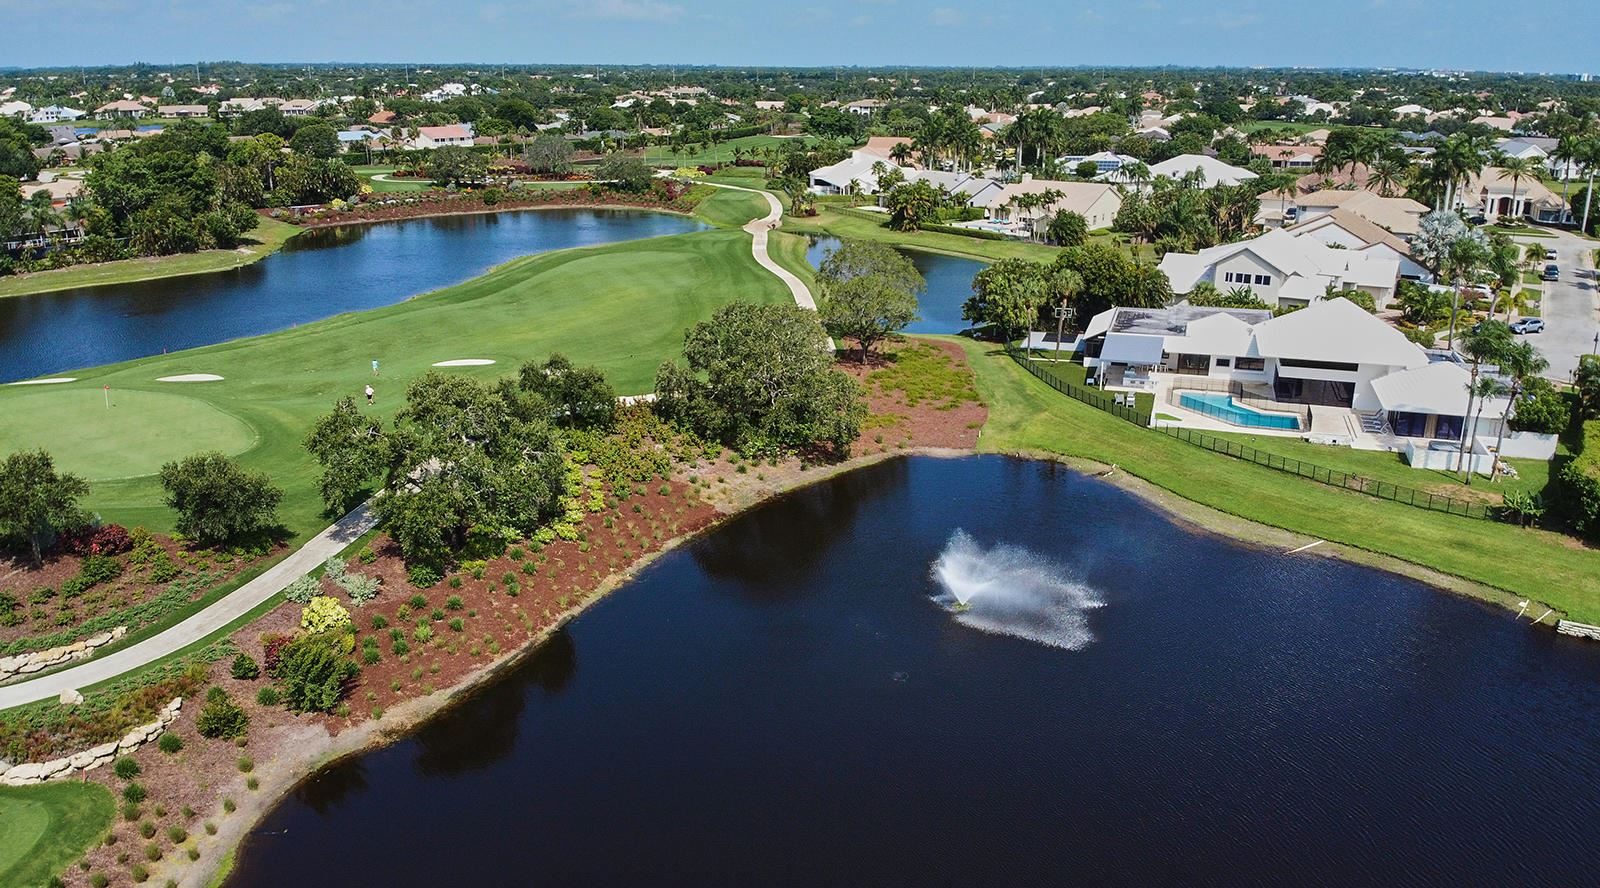 17207 Shaddock Lane, Boca Raton, FL 33487 - #: RX-10625503